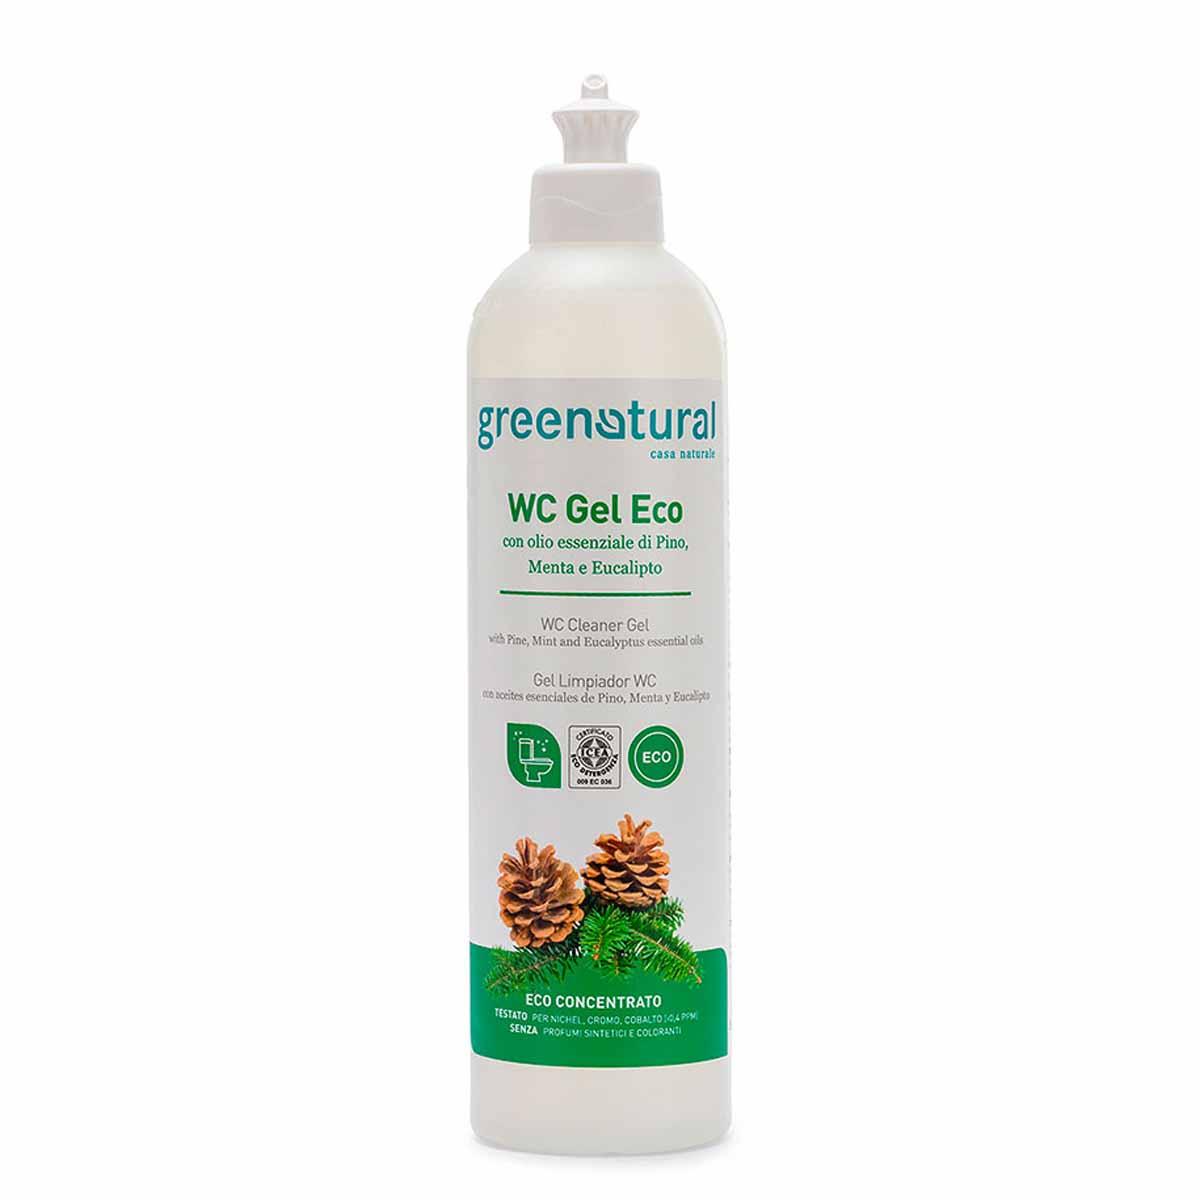 Greenatural – WC Gel Eco